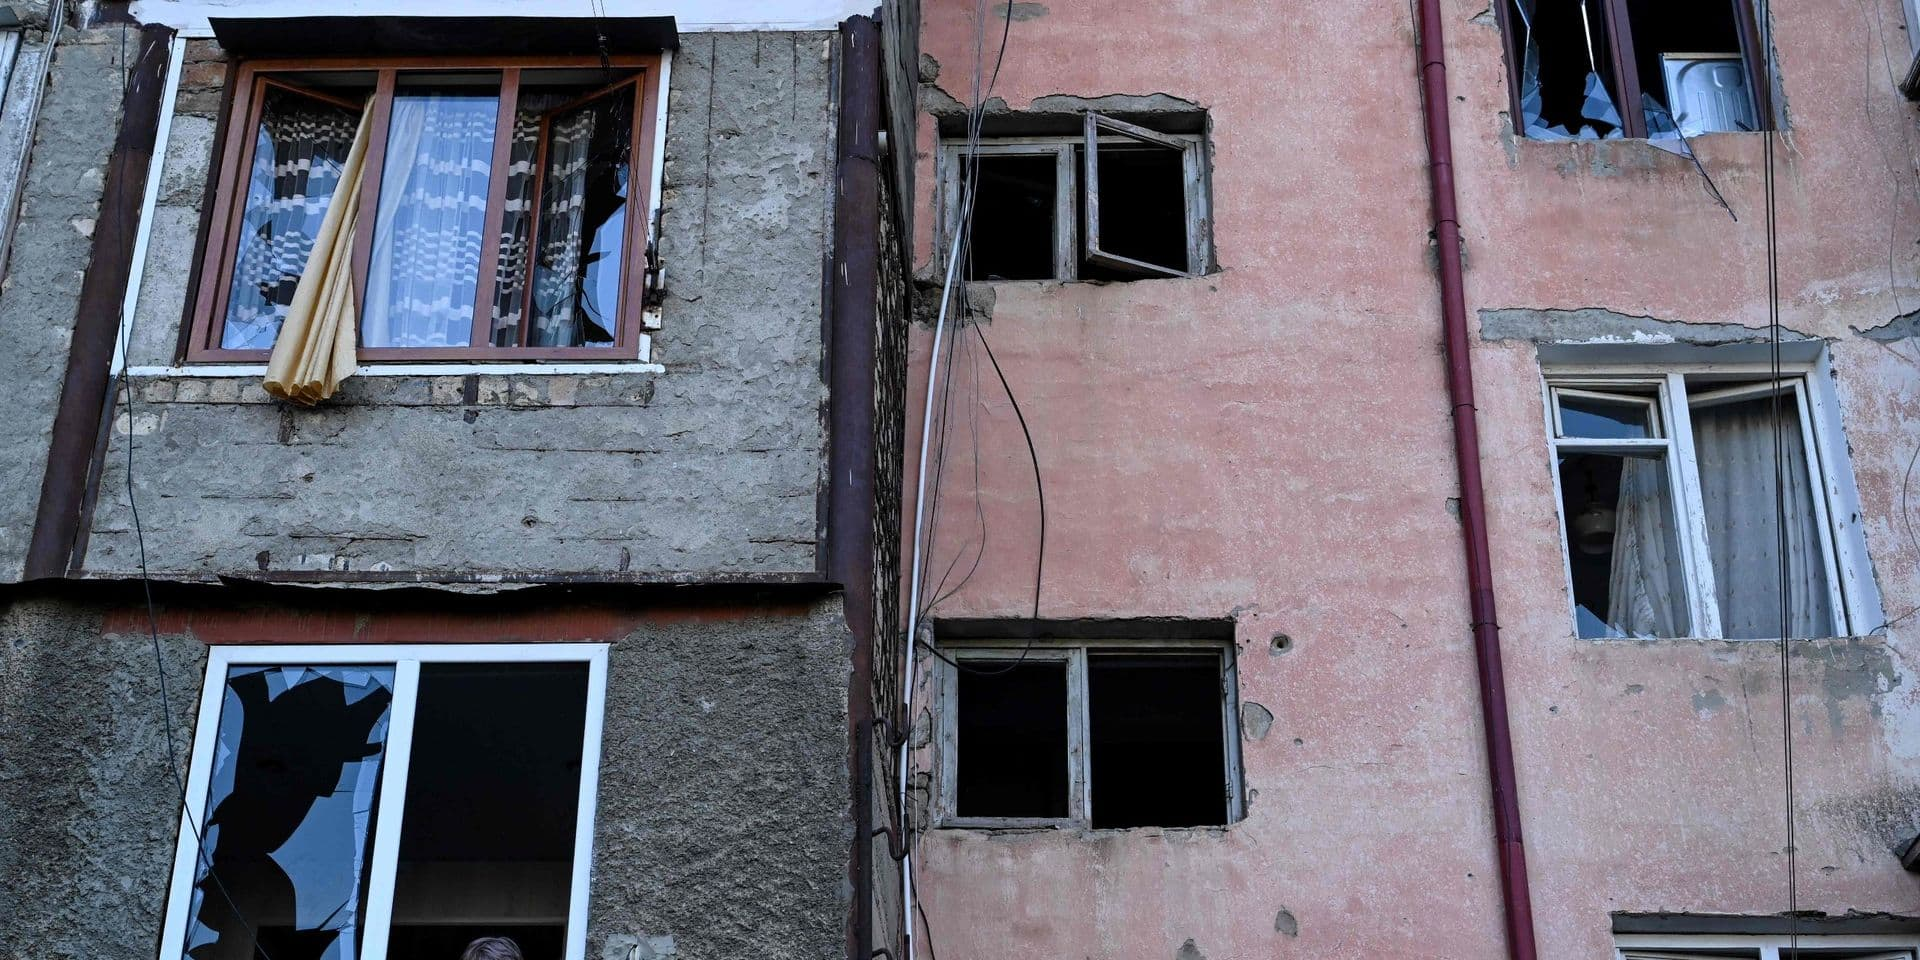 Conflit en Azerbaïdjan: de nouvelles frappes visent Stepanakert, capitale du Karabakh